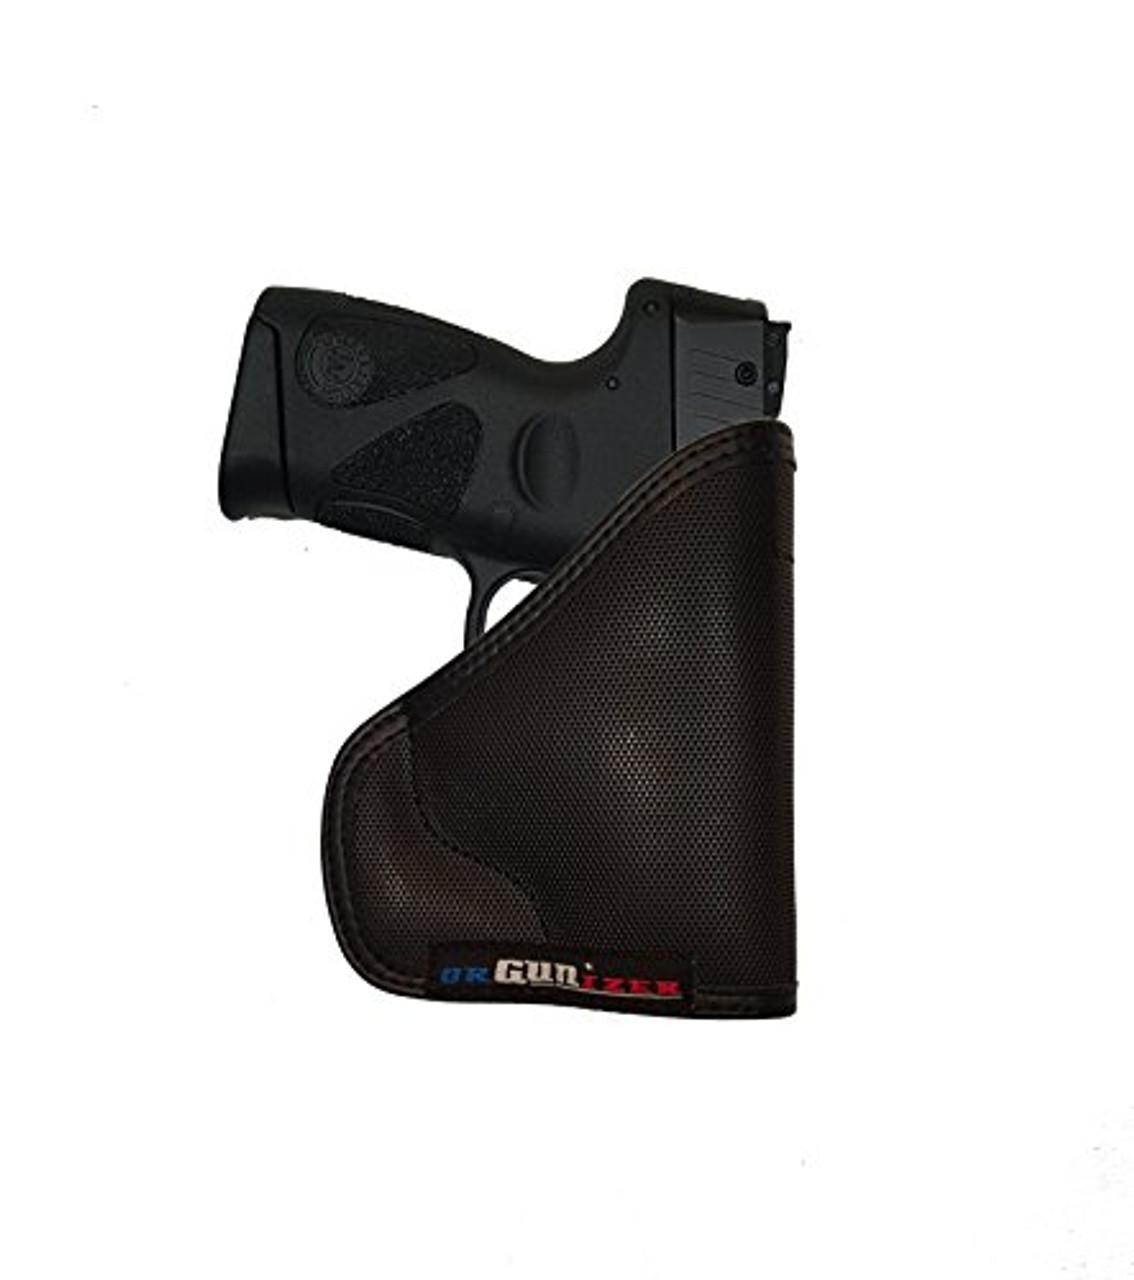 Taurus PT111  Gen2 G2 G2c Millennium Custom Fit Leather Trimmed orGUNizer Poly Pocket Holster For Concealed Carry Comfort by Garrison Grip (D)